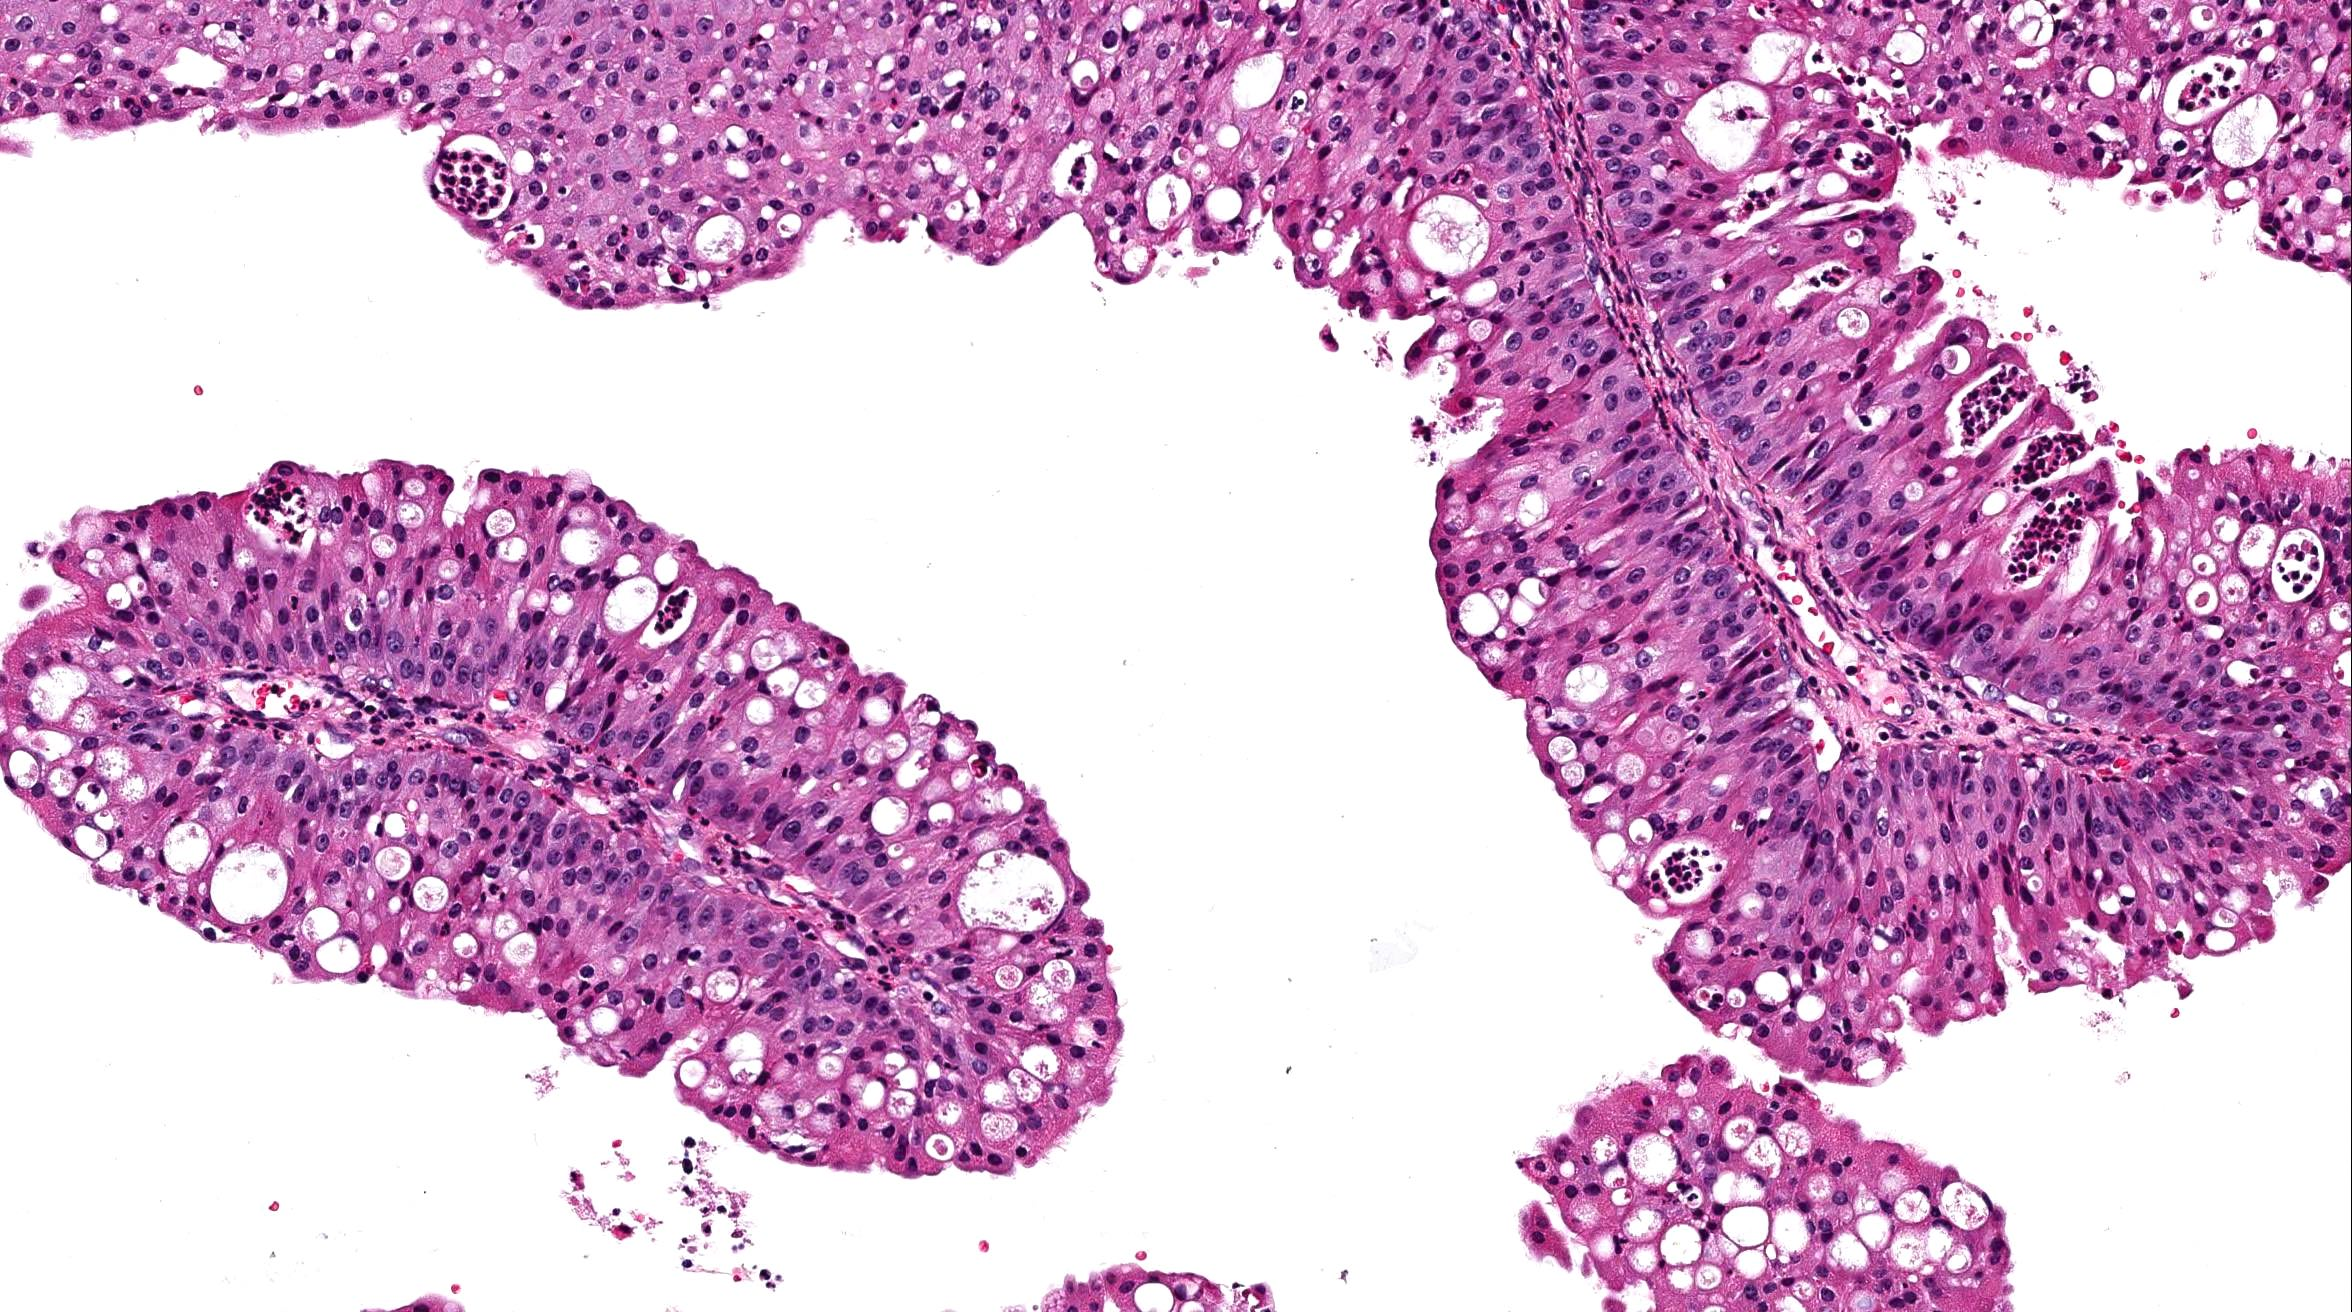 urothelial papilloma pathology outlines